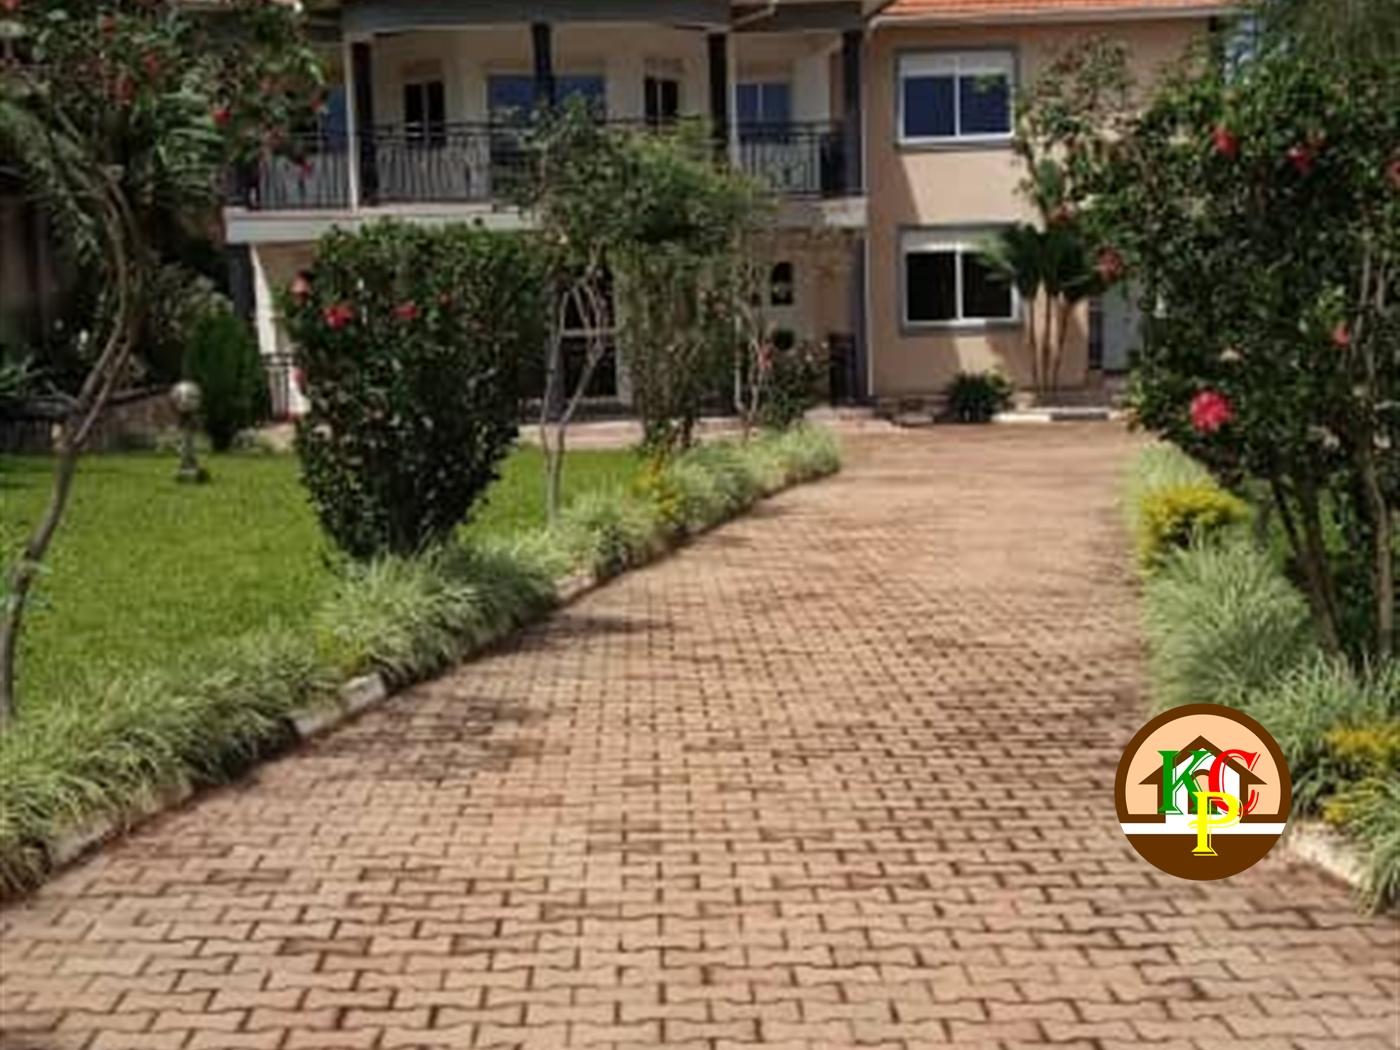 Storeyed house for rent in Bwebajja Wakiso